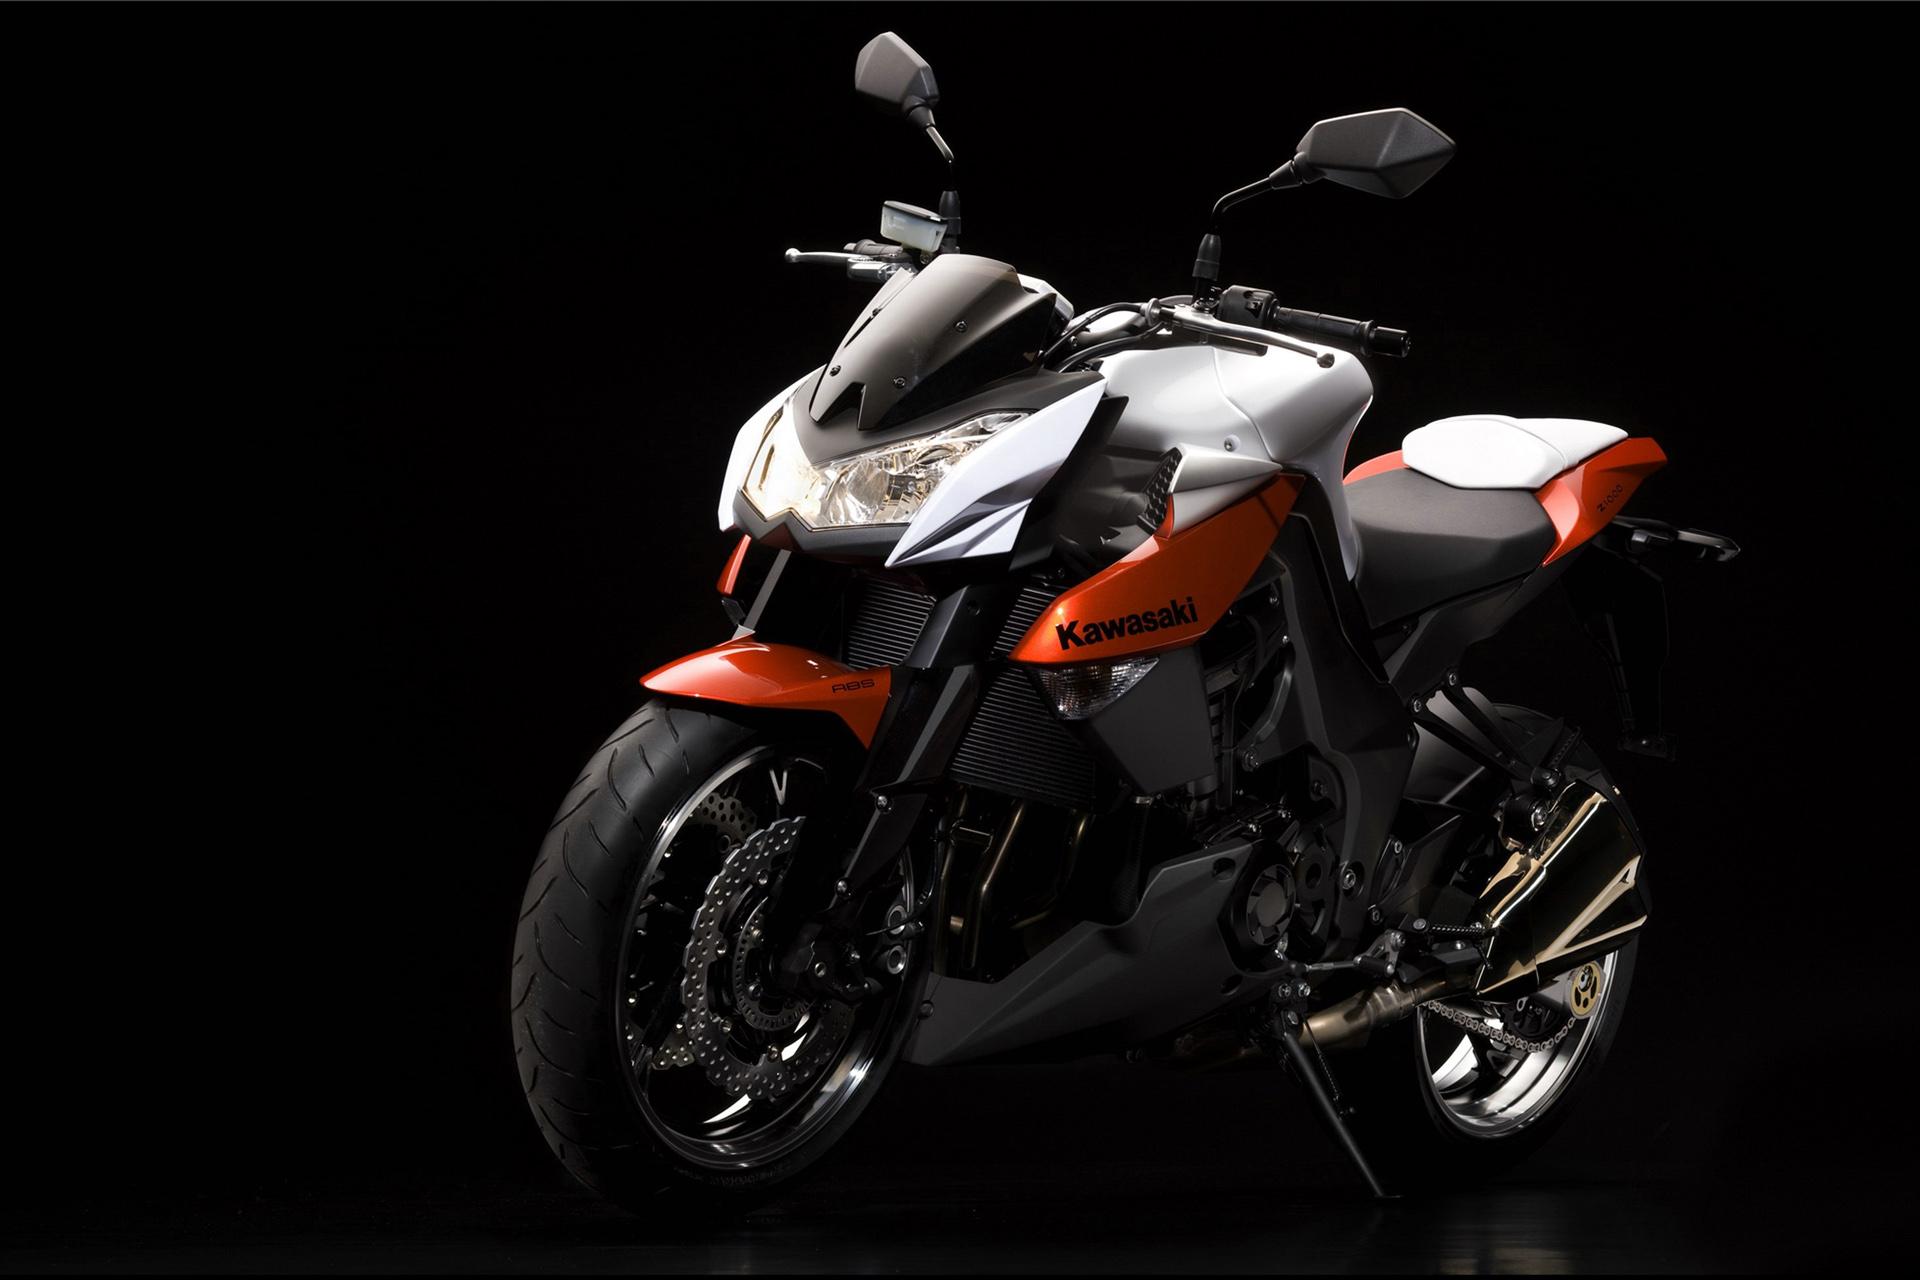 Kawasaki Z1000 Photos Photogallery With 9 Pics Carsbase Com